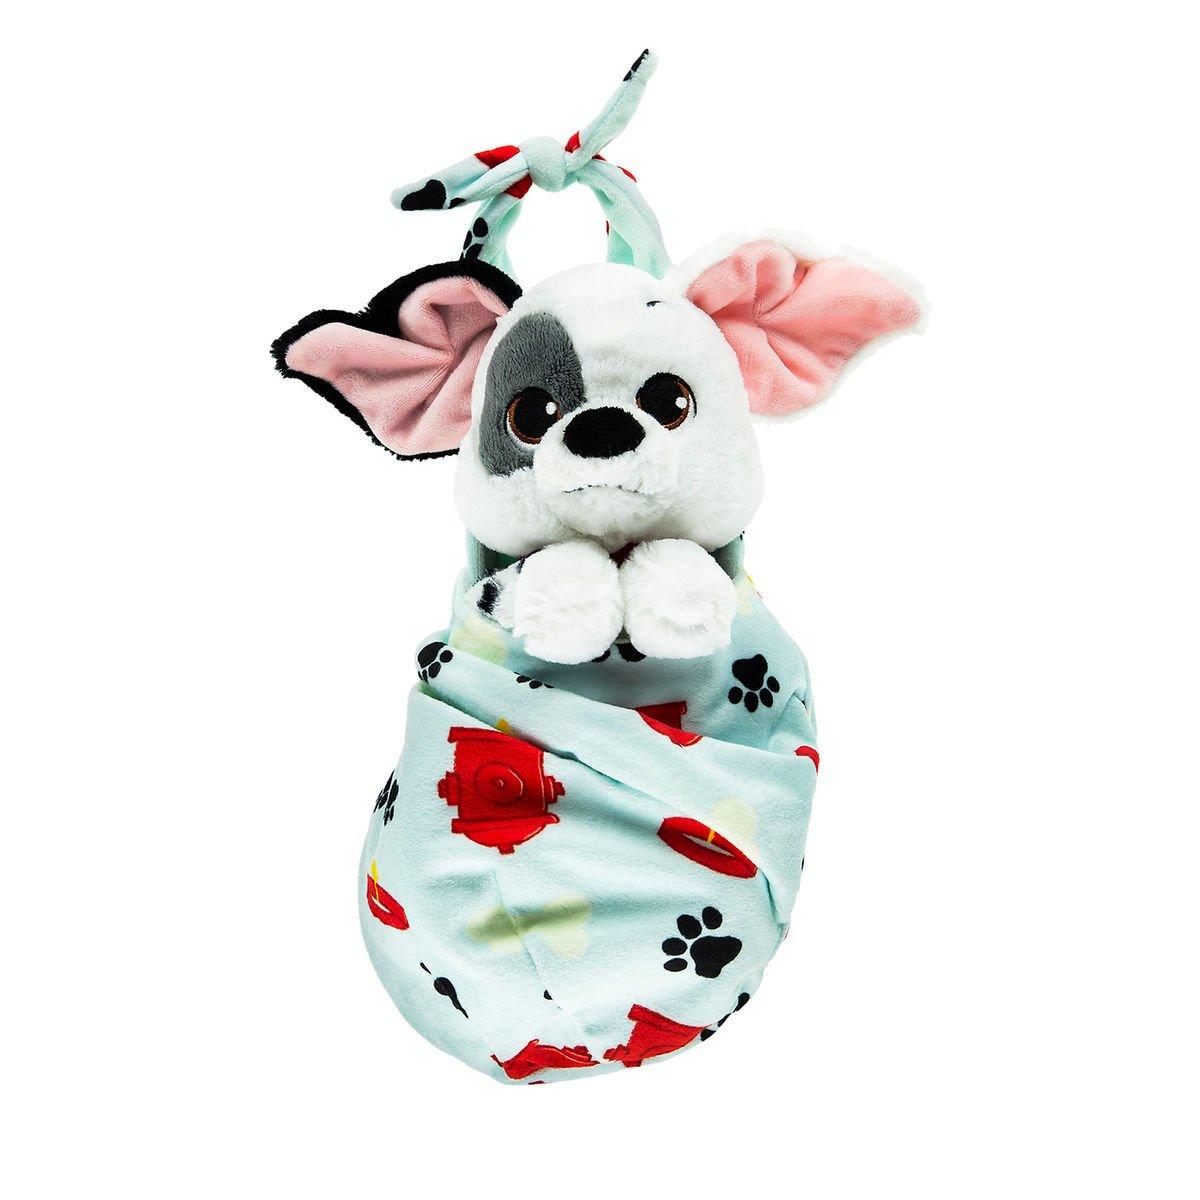 Disney Parks Patch Plush with Blanket Pouch - 101 Dalmatians - Disney Babies - Small